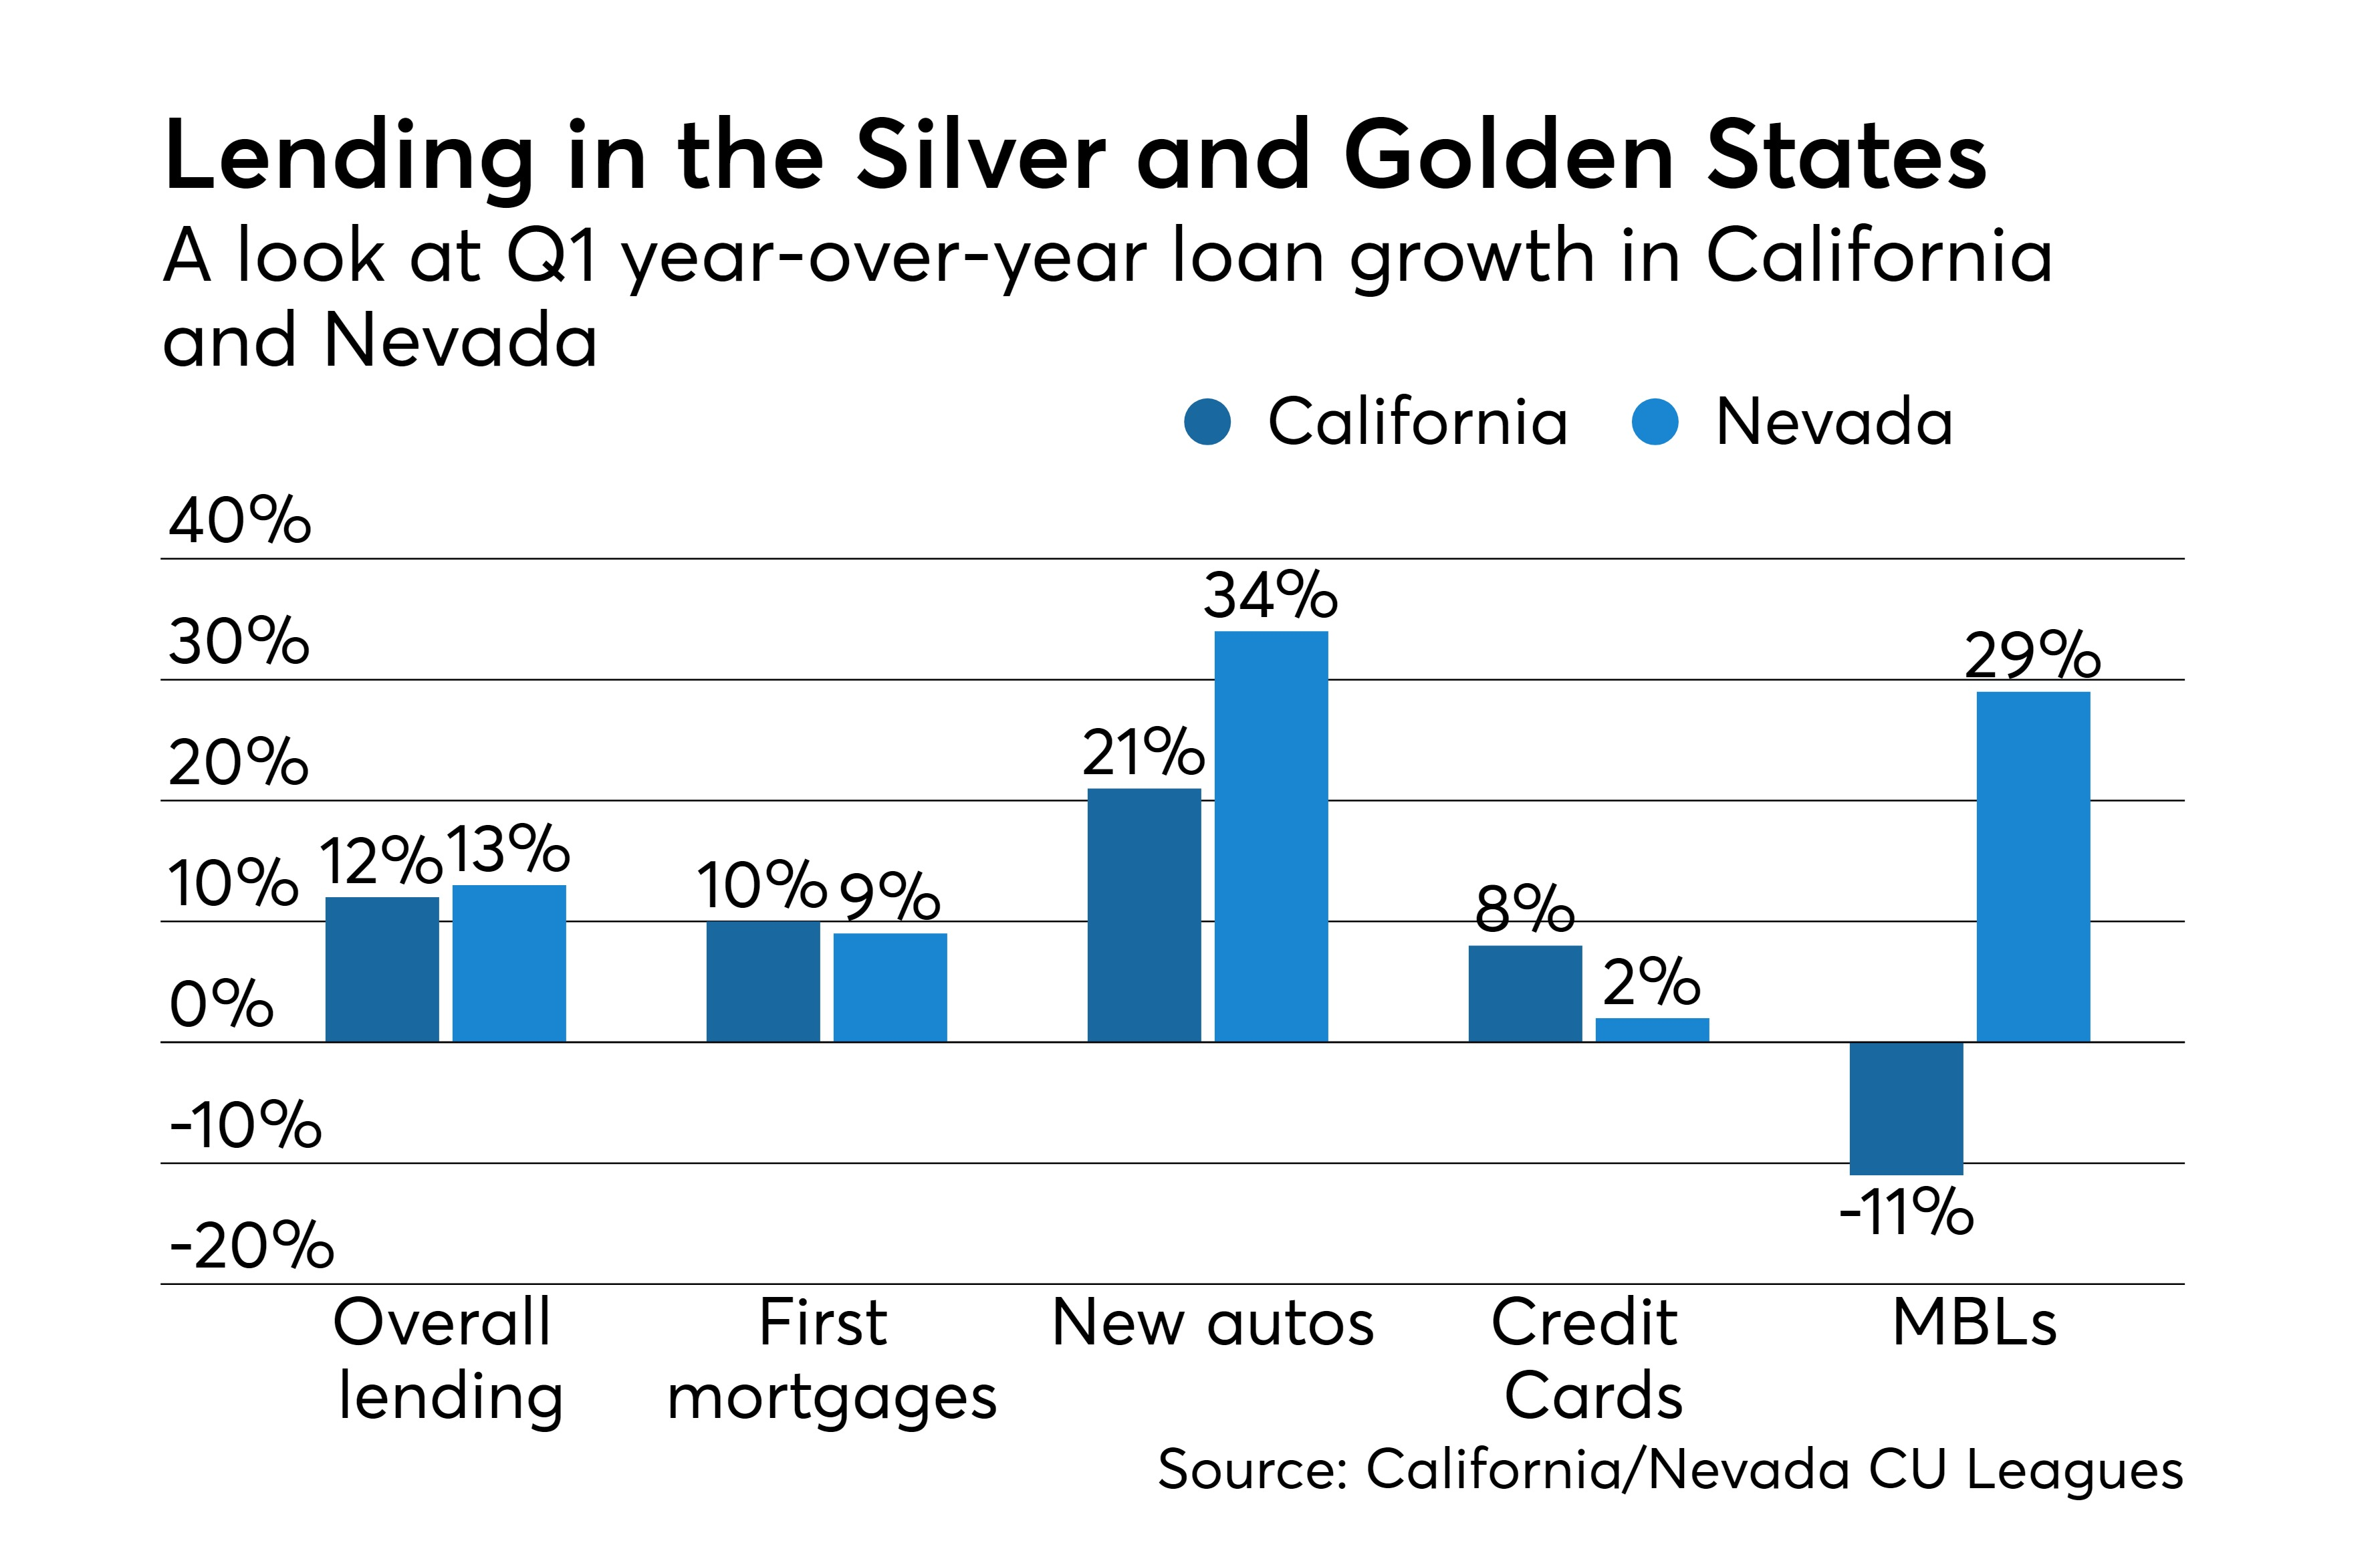 https://assets.sourcemedia.com/ab/28/cdaeb6584739b7d2219d1699132f/california-and-nevada-loan-growth-q1-2018-cuj-071818.jpeg